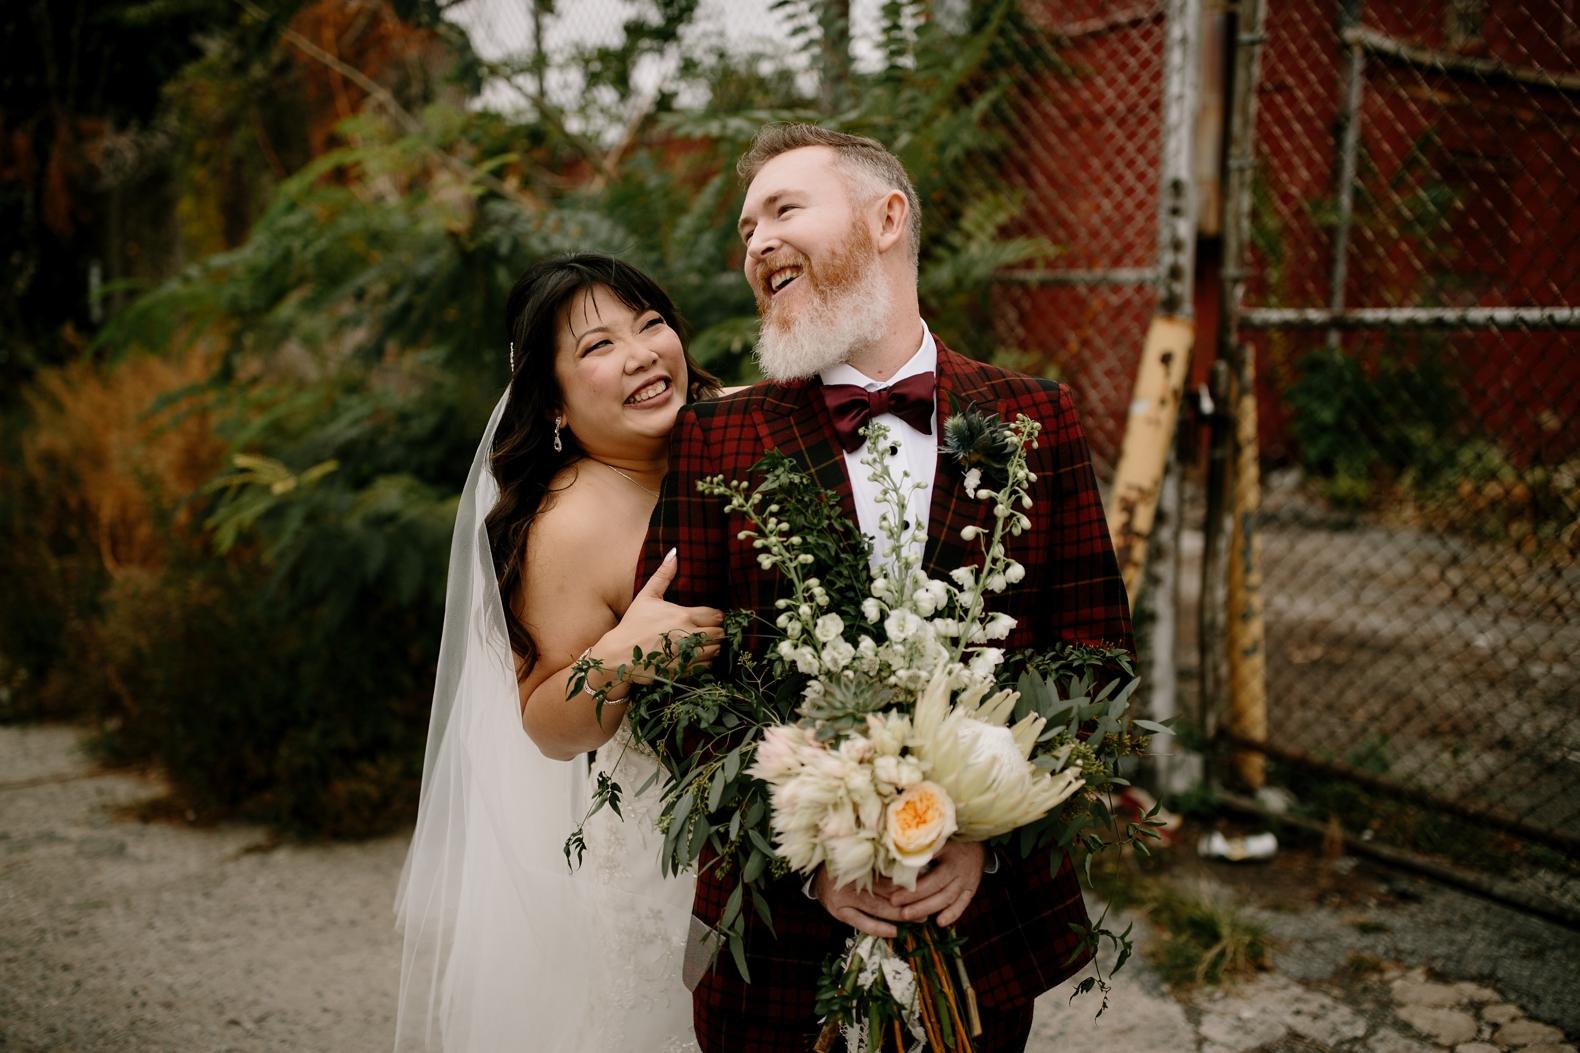 501-union-wedding-0051